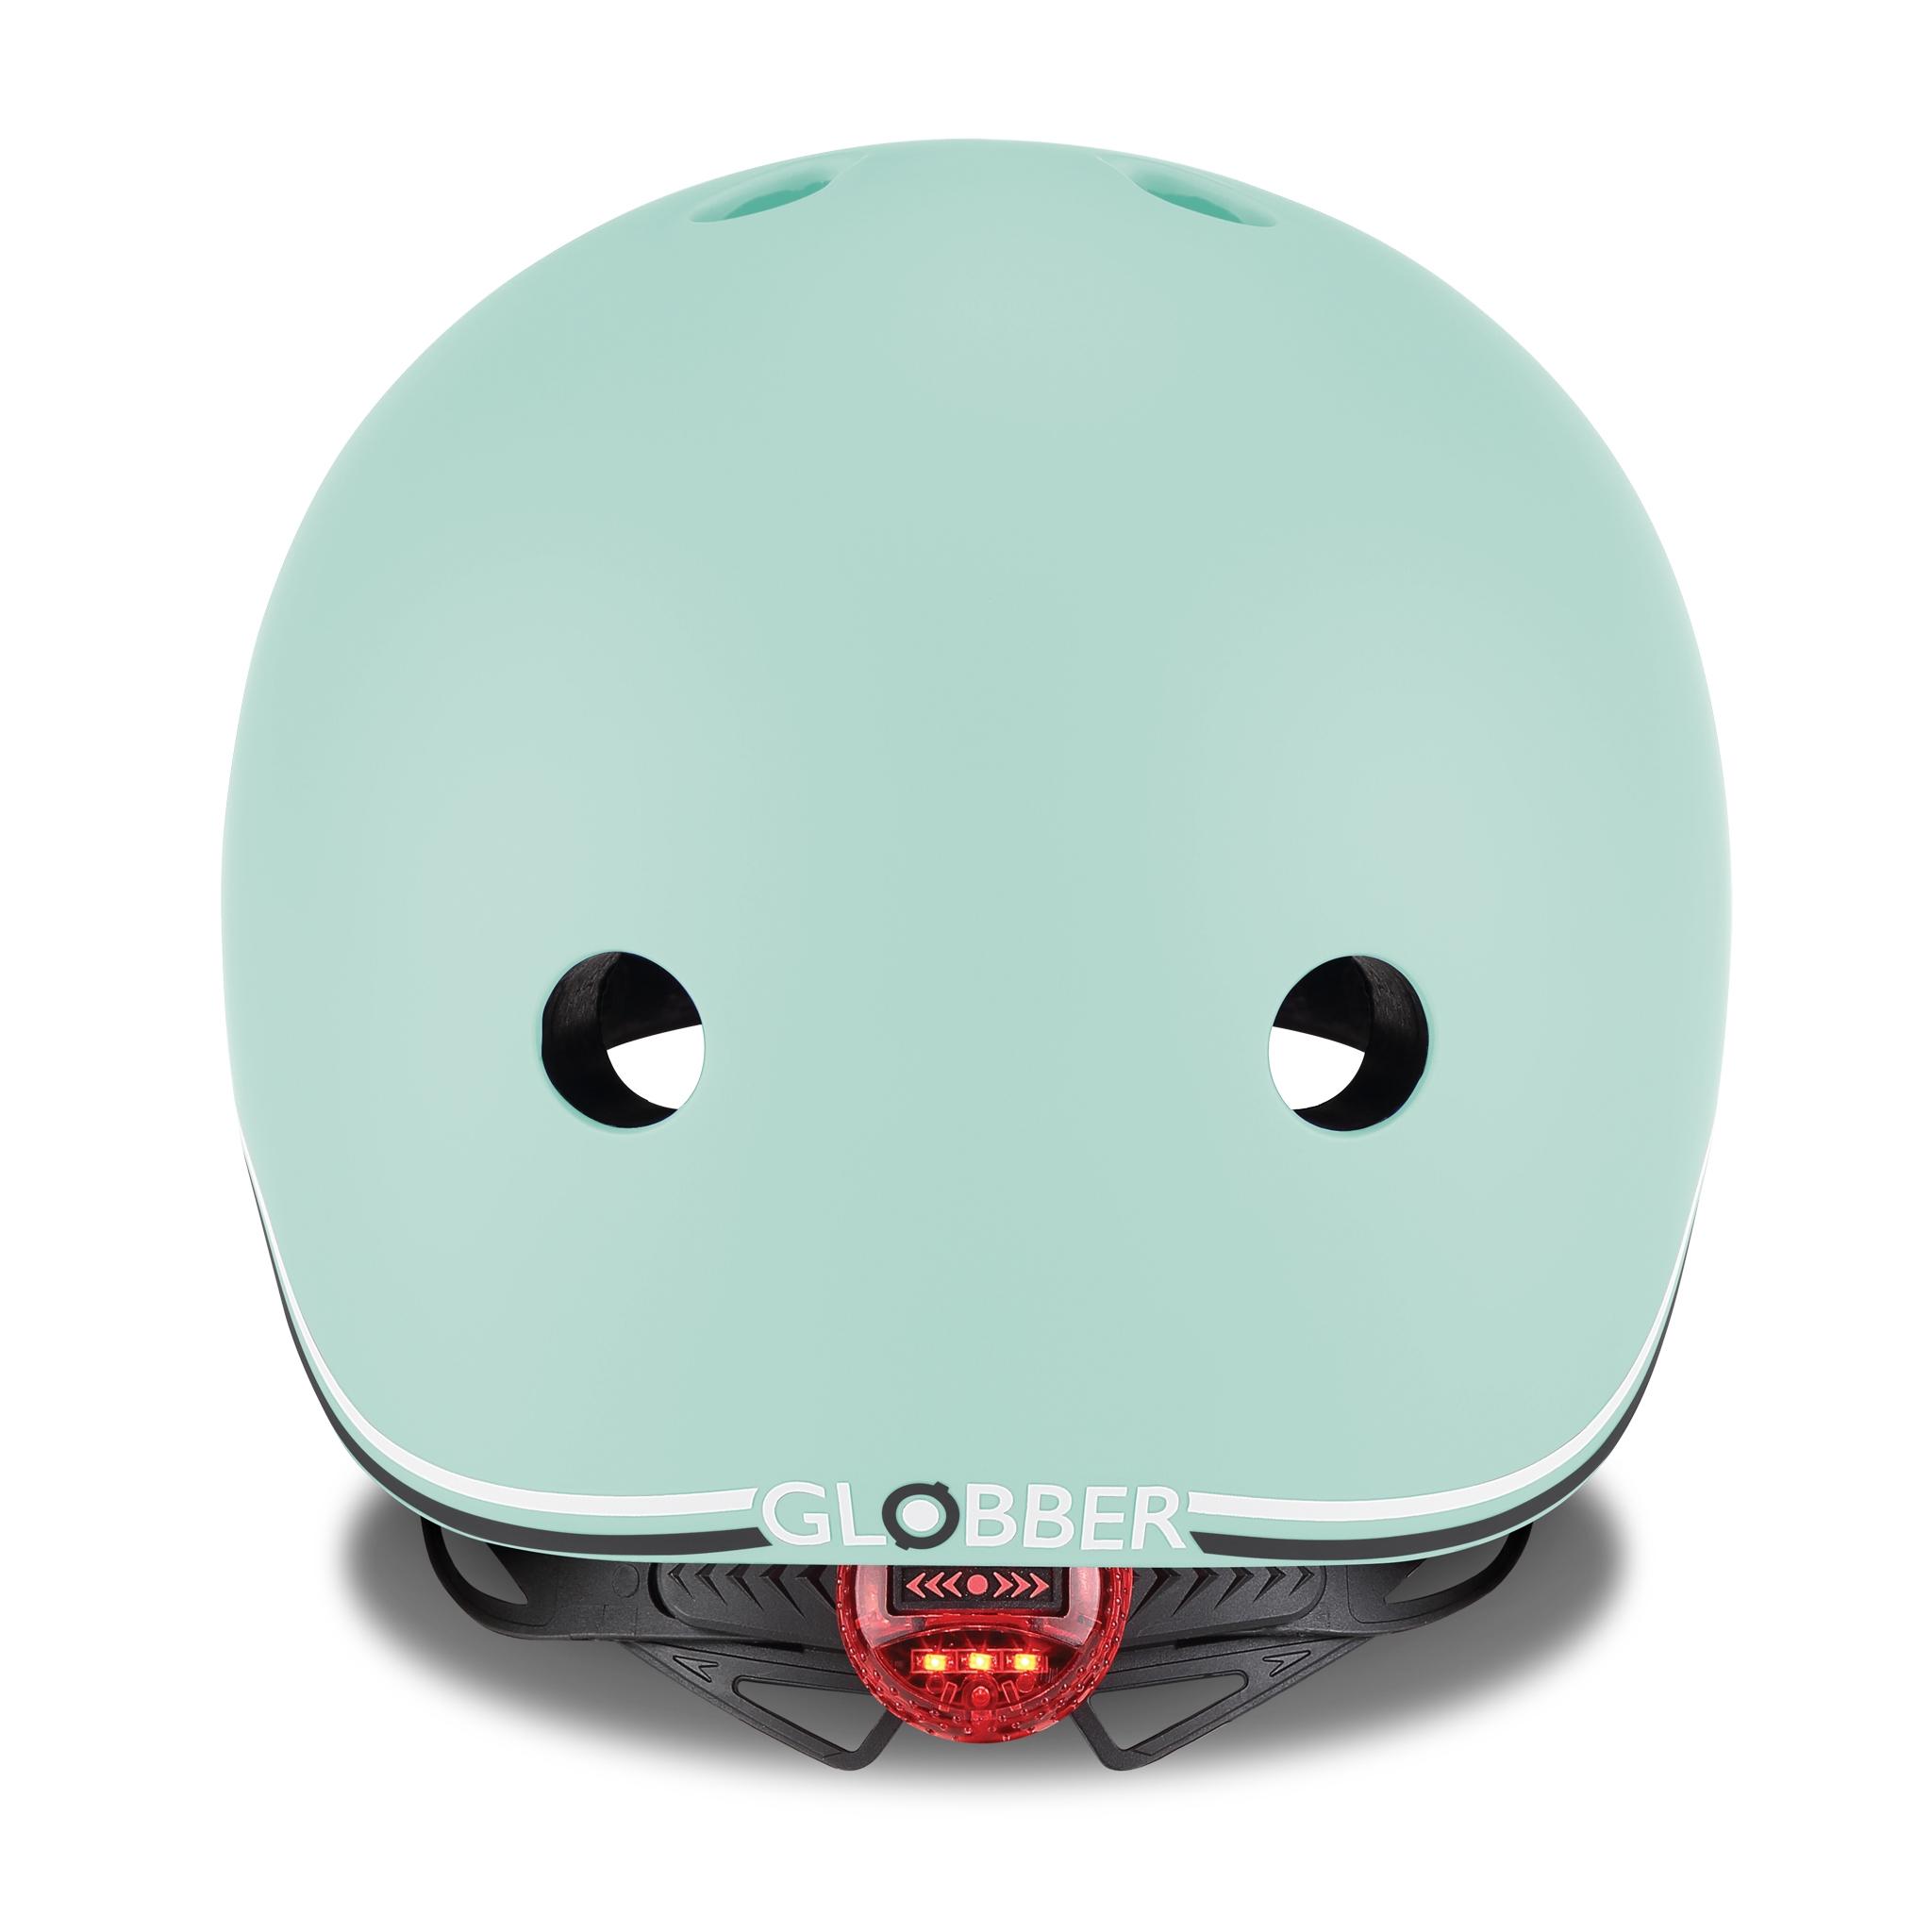 GO-UP-helmets-scooter-helmets-for-toddlers-with-LED-lights-safe-helmet-for-toddlers-pastel-green 2